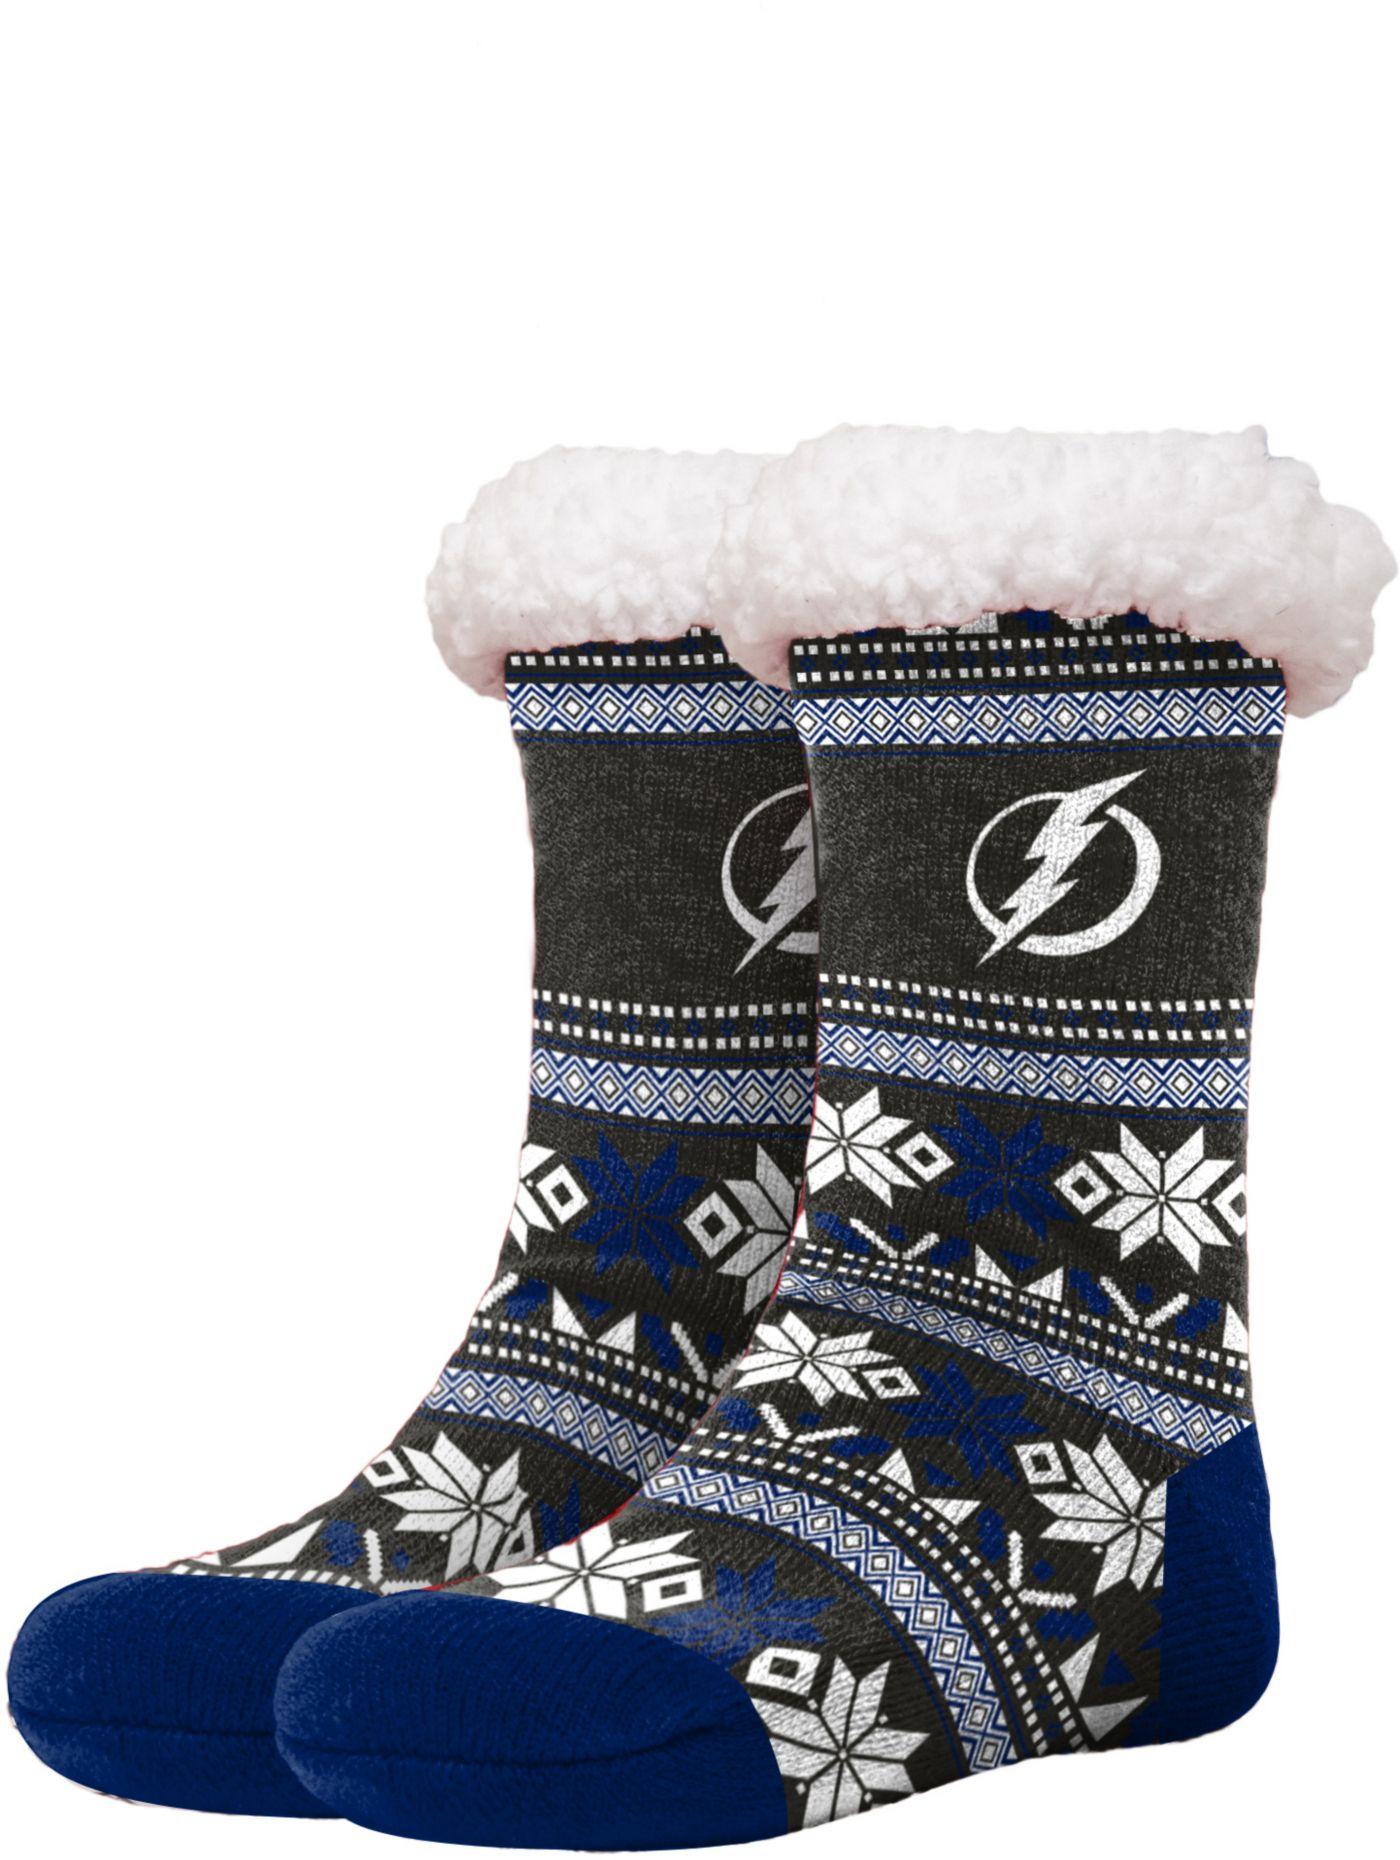 FOCO Tampa Bay Lightning Footy Slippers